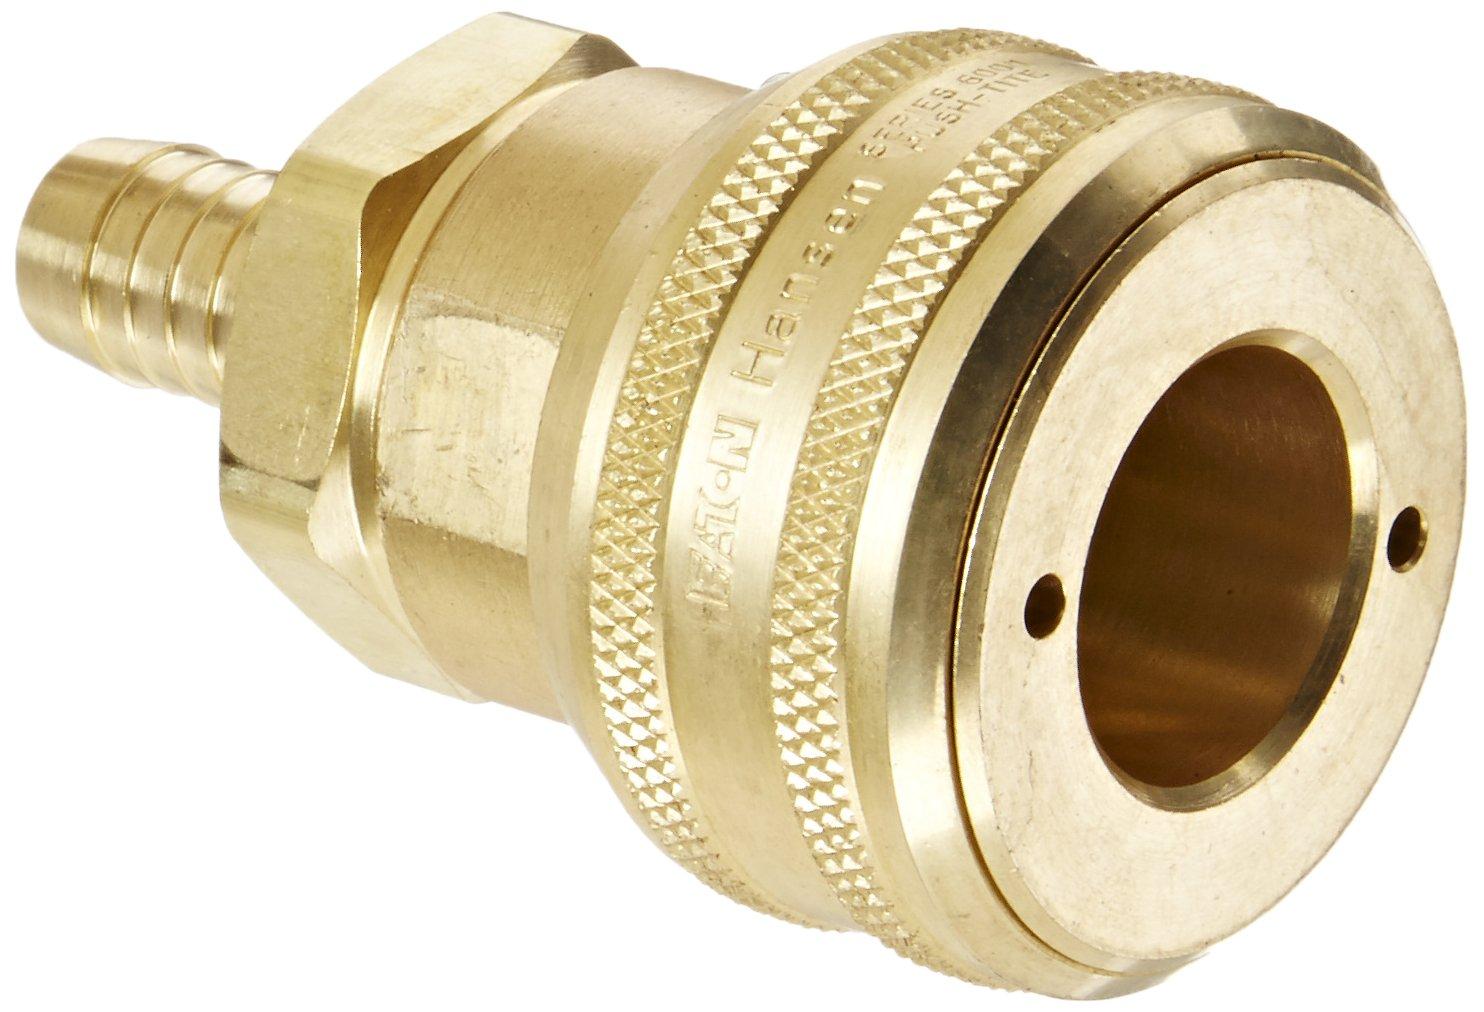 Eaton Hansen 6800SL Brass Interchange Fixed price for sale Fitting Pin Bombing new work Lock Pneumatic